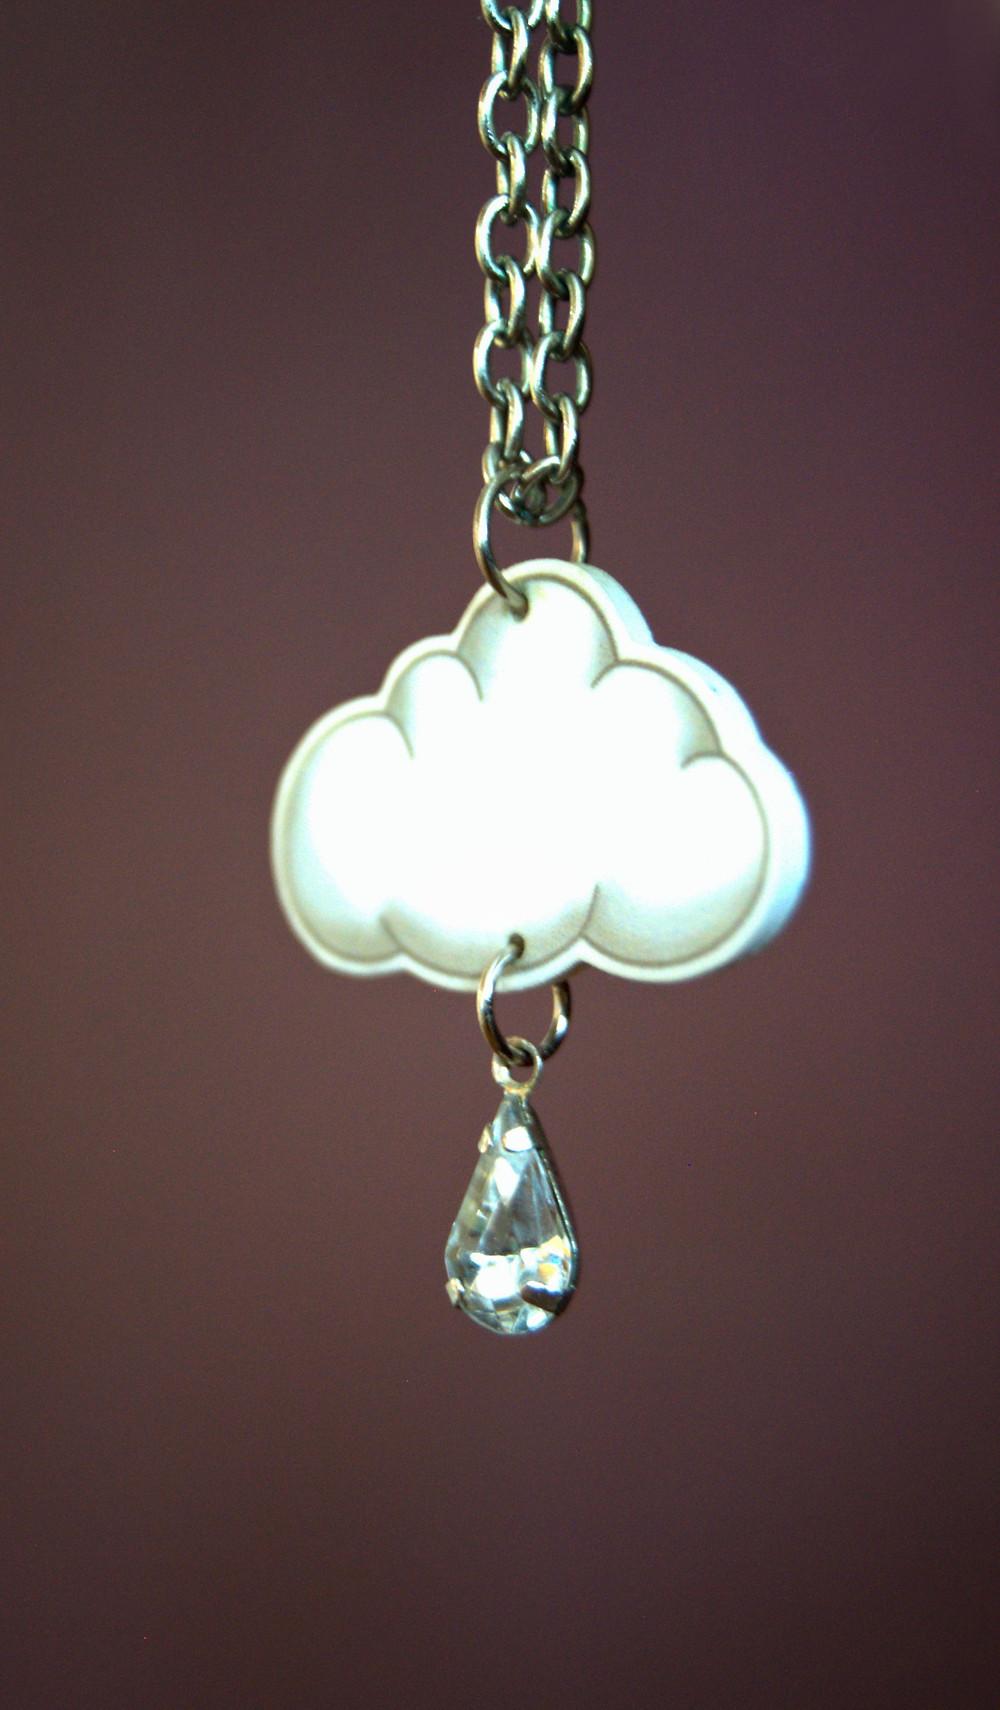 Raincloud necklace with raindrop